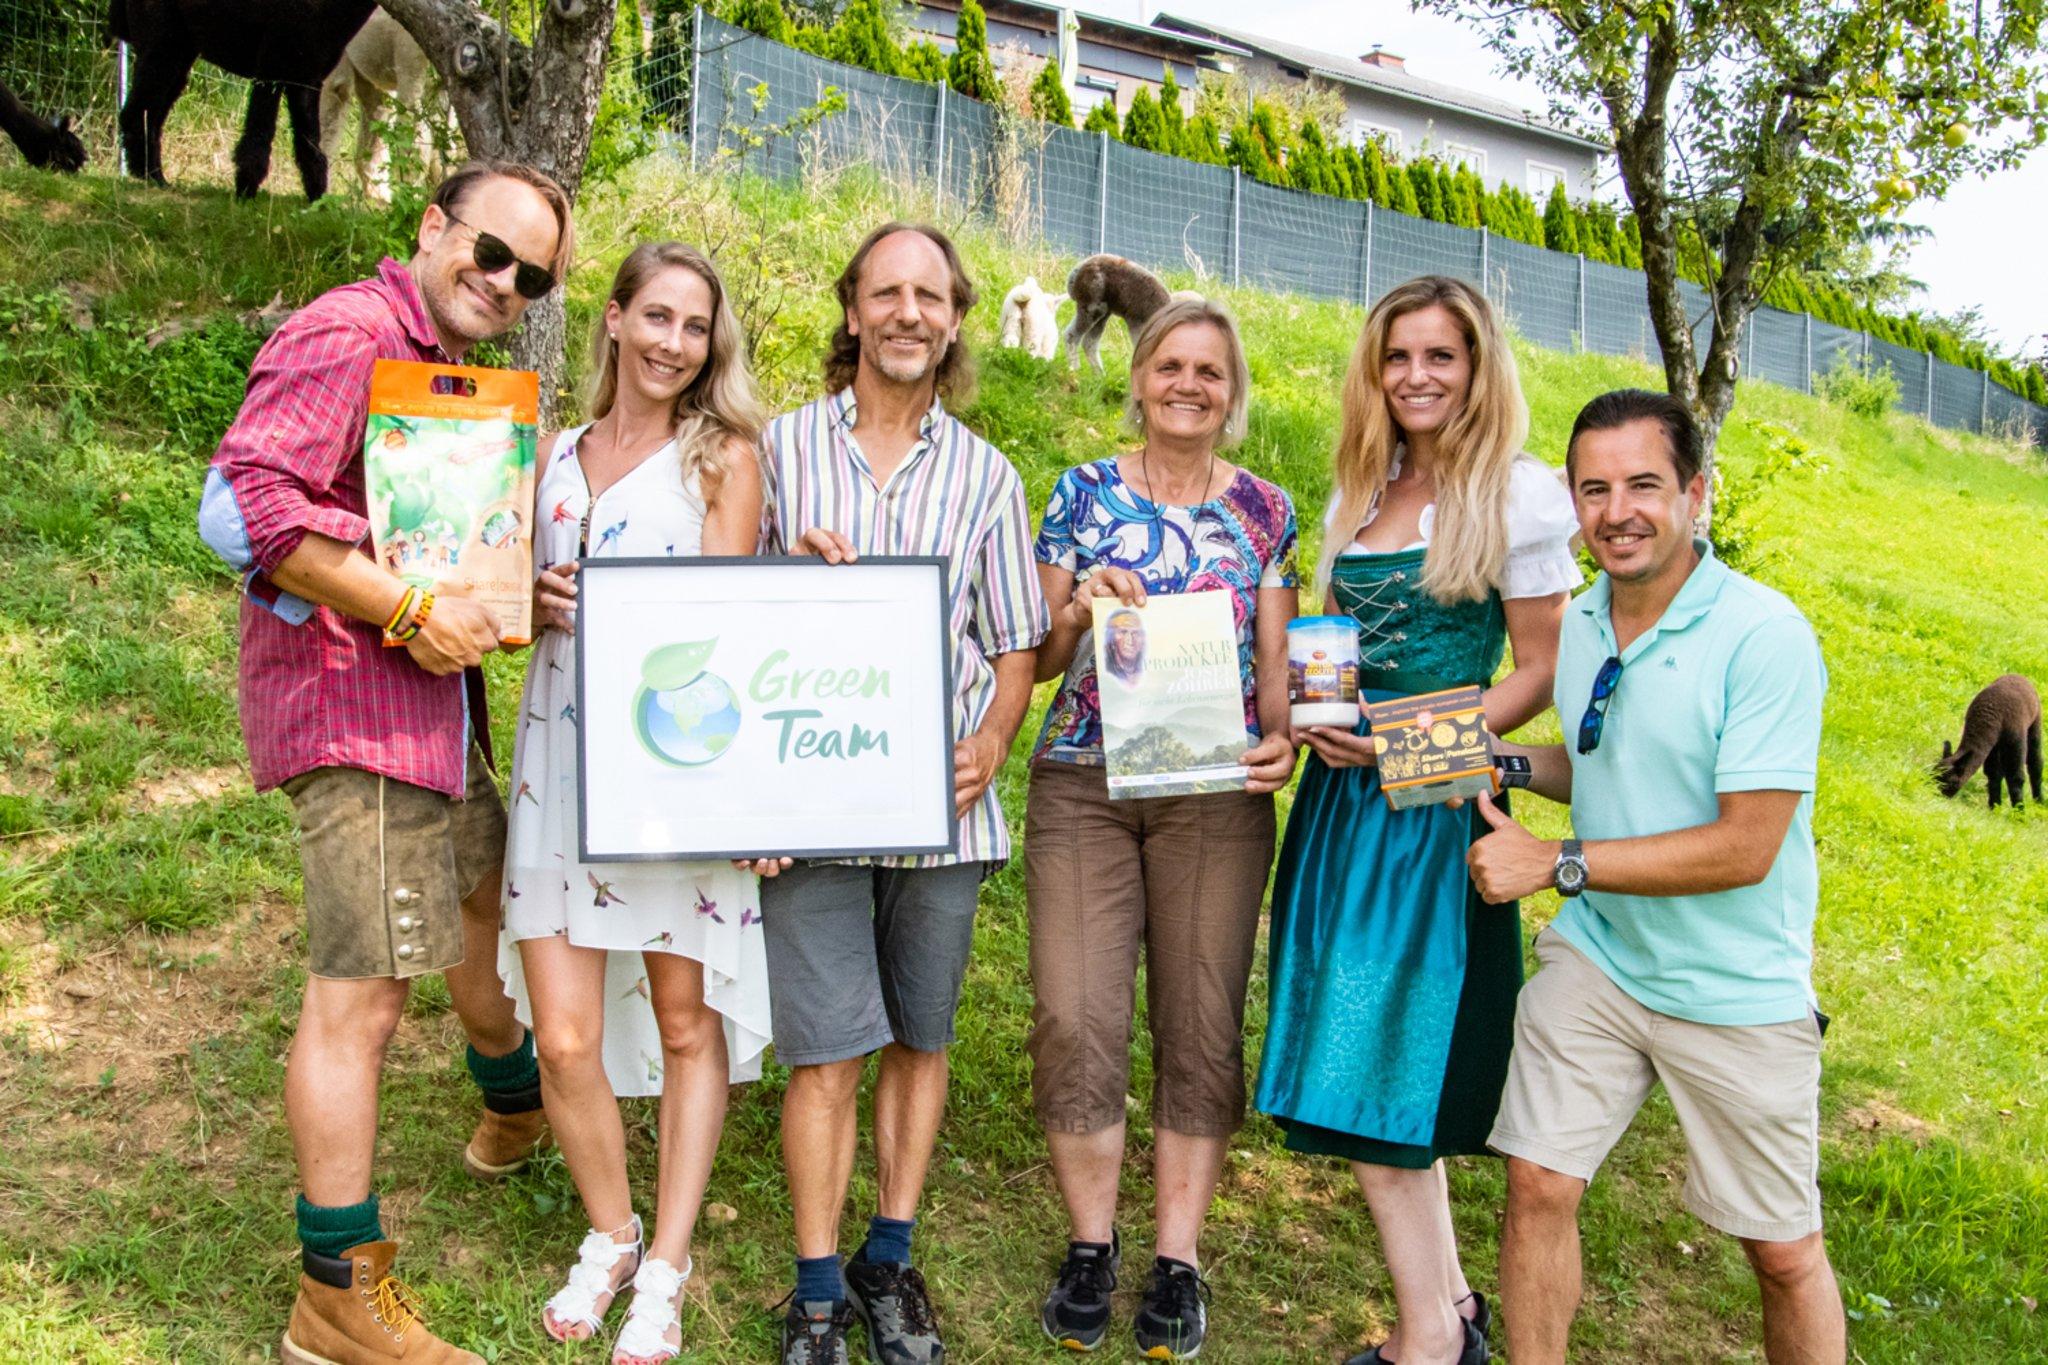 green-team-drehtag-mit-stargast-leo-aberer-models-im-naturpardies-z-hrer-in-st-nikolai